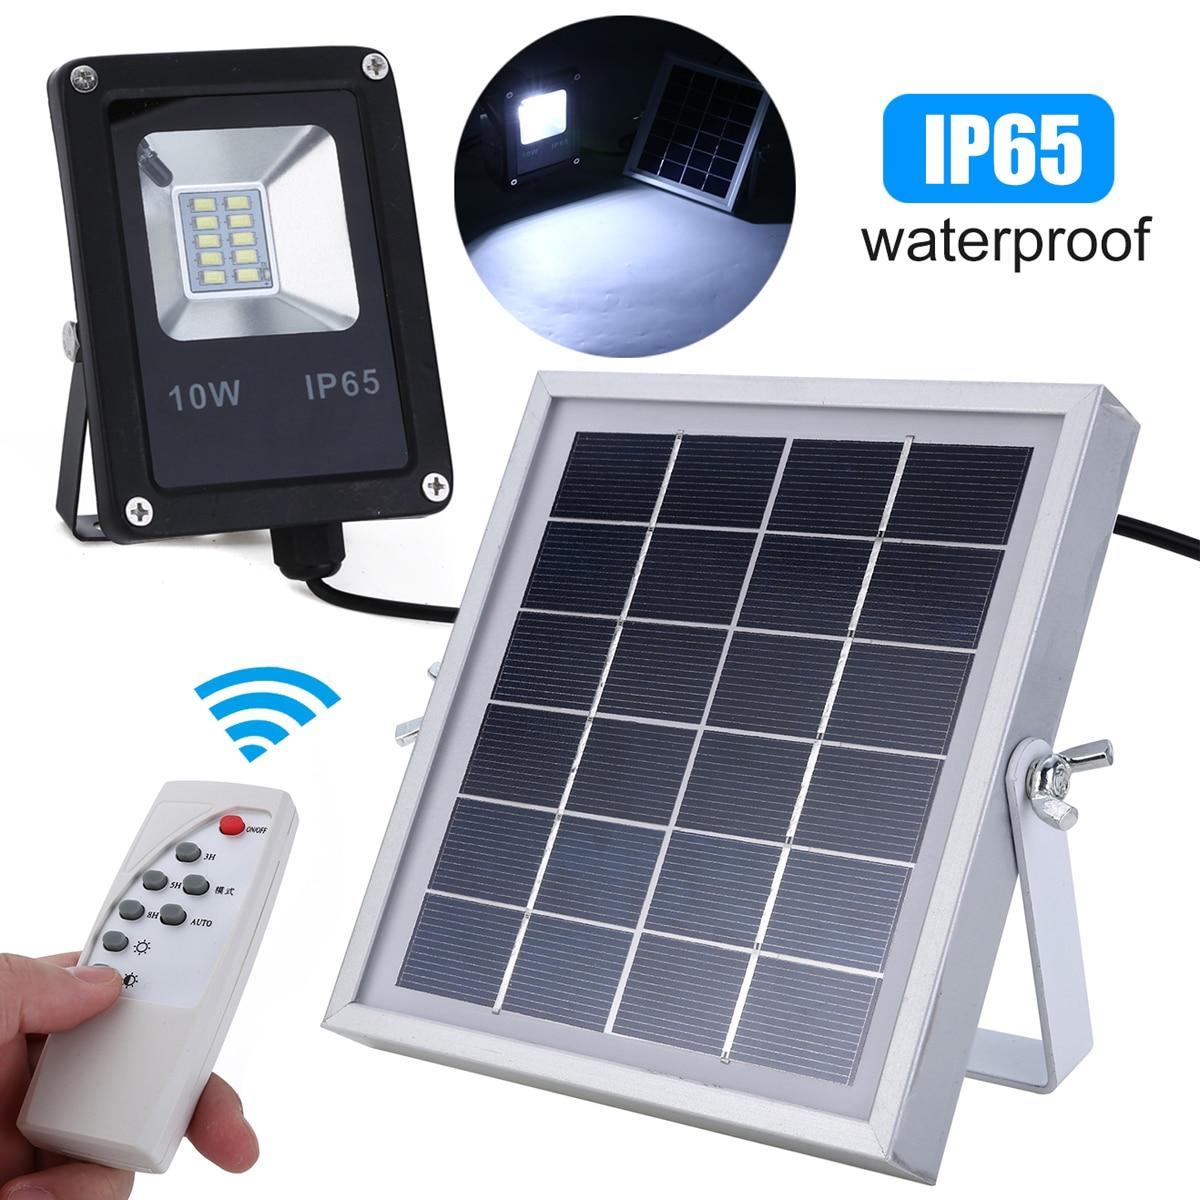 10W LED Waterproof Solar Lamp Powered Sensor Spotlights Flood Light Garden Outdoor Security Lamp Mayitr|Solar Lamps| |  - title=